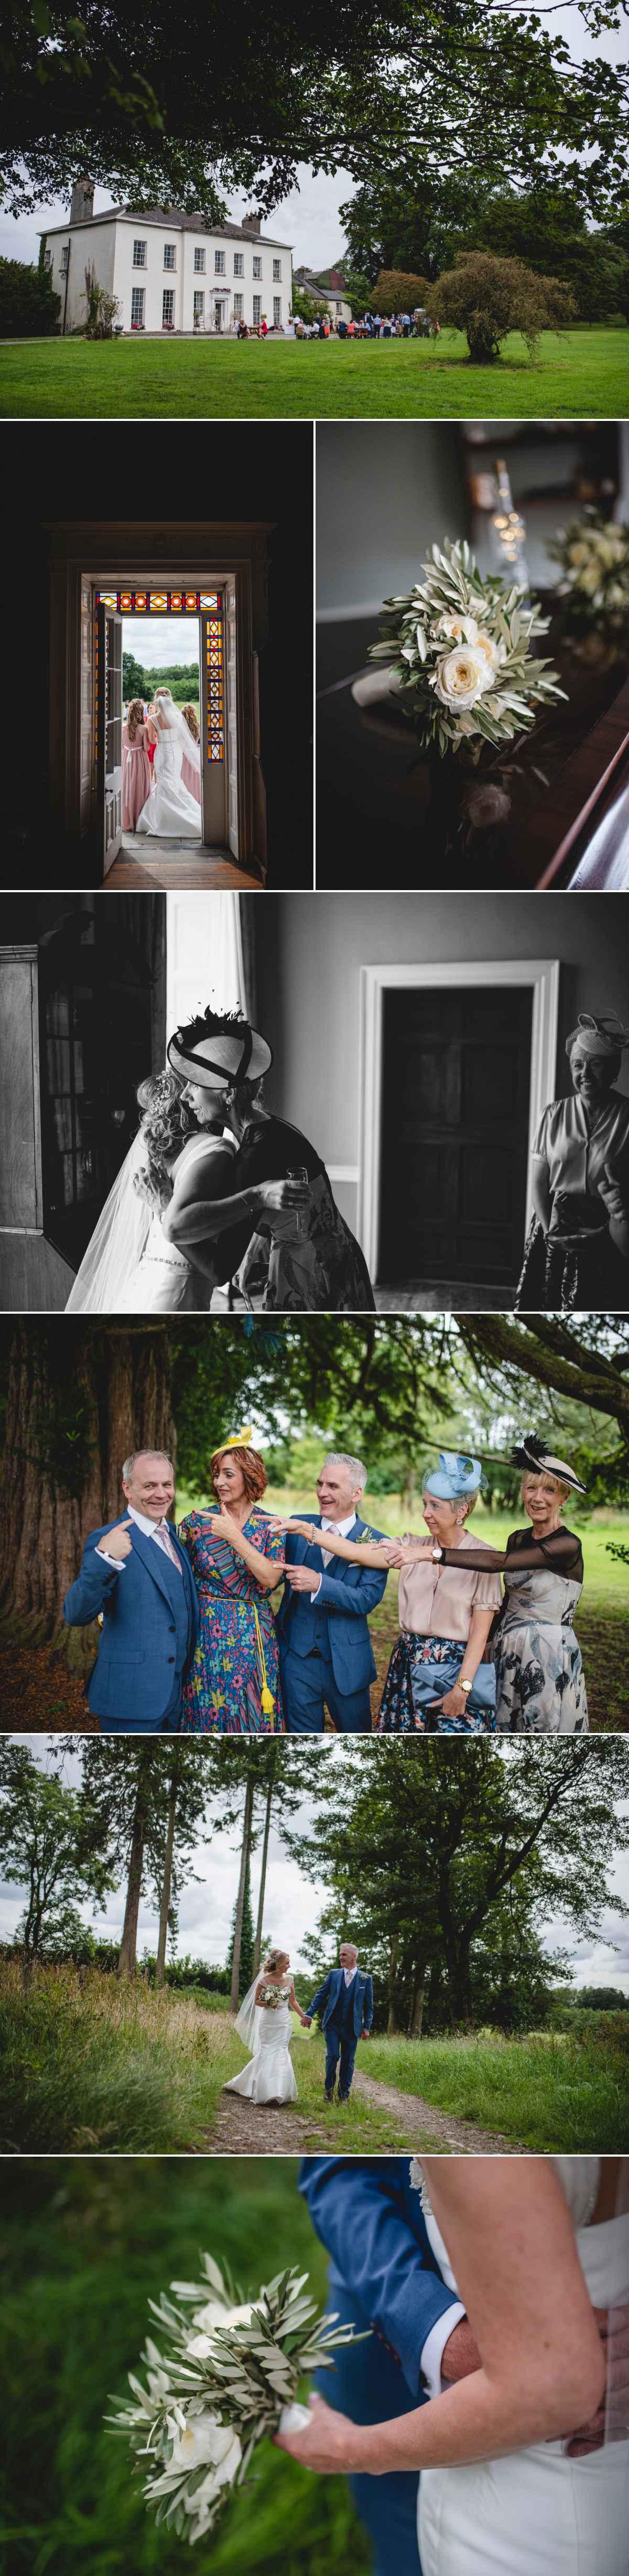 Rustic Wedding Ireland Photographer 11.jpg